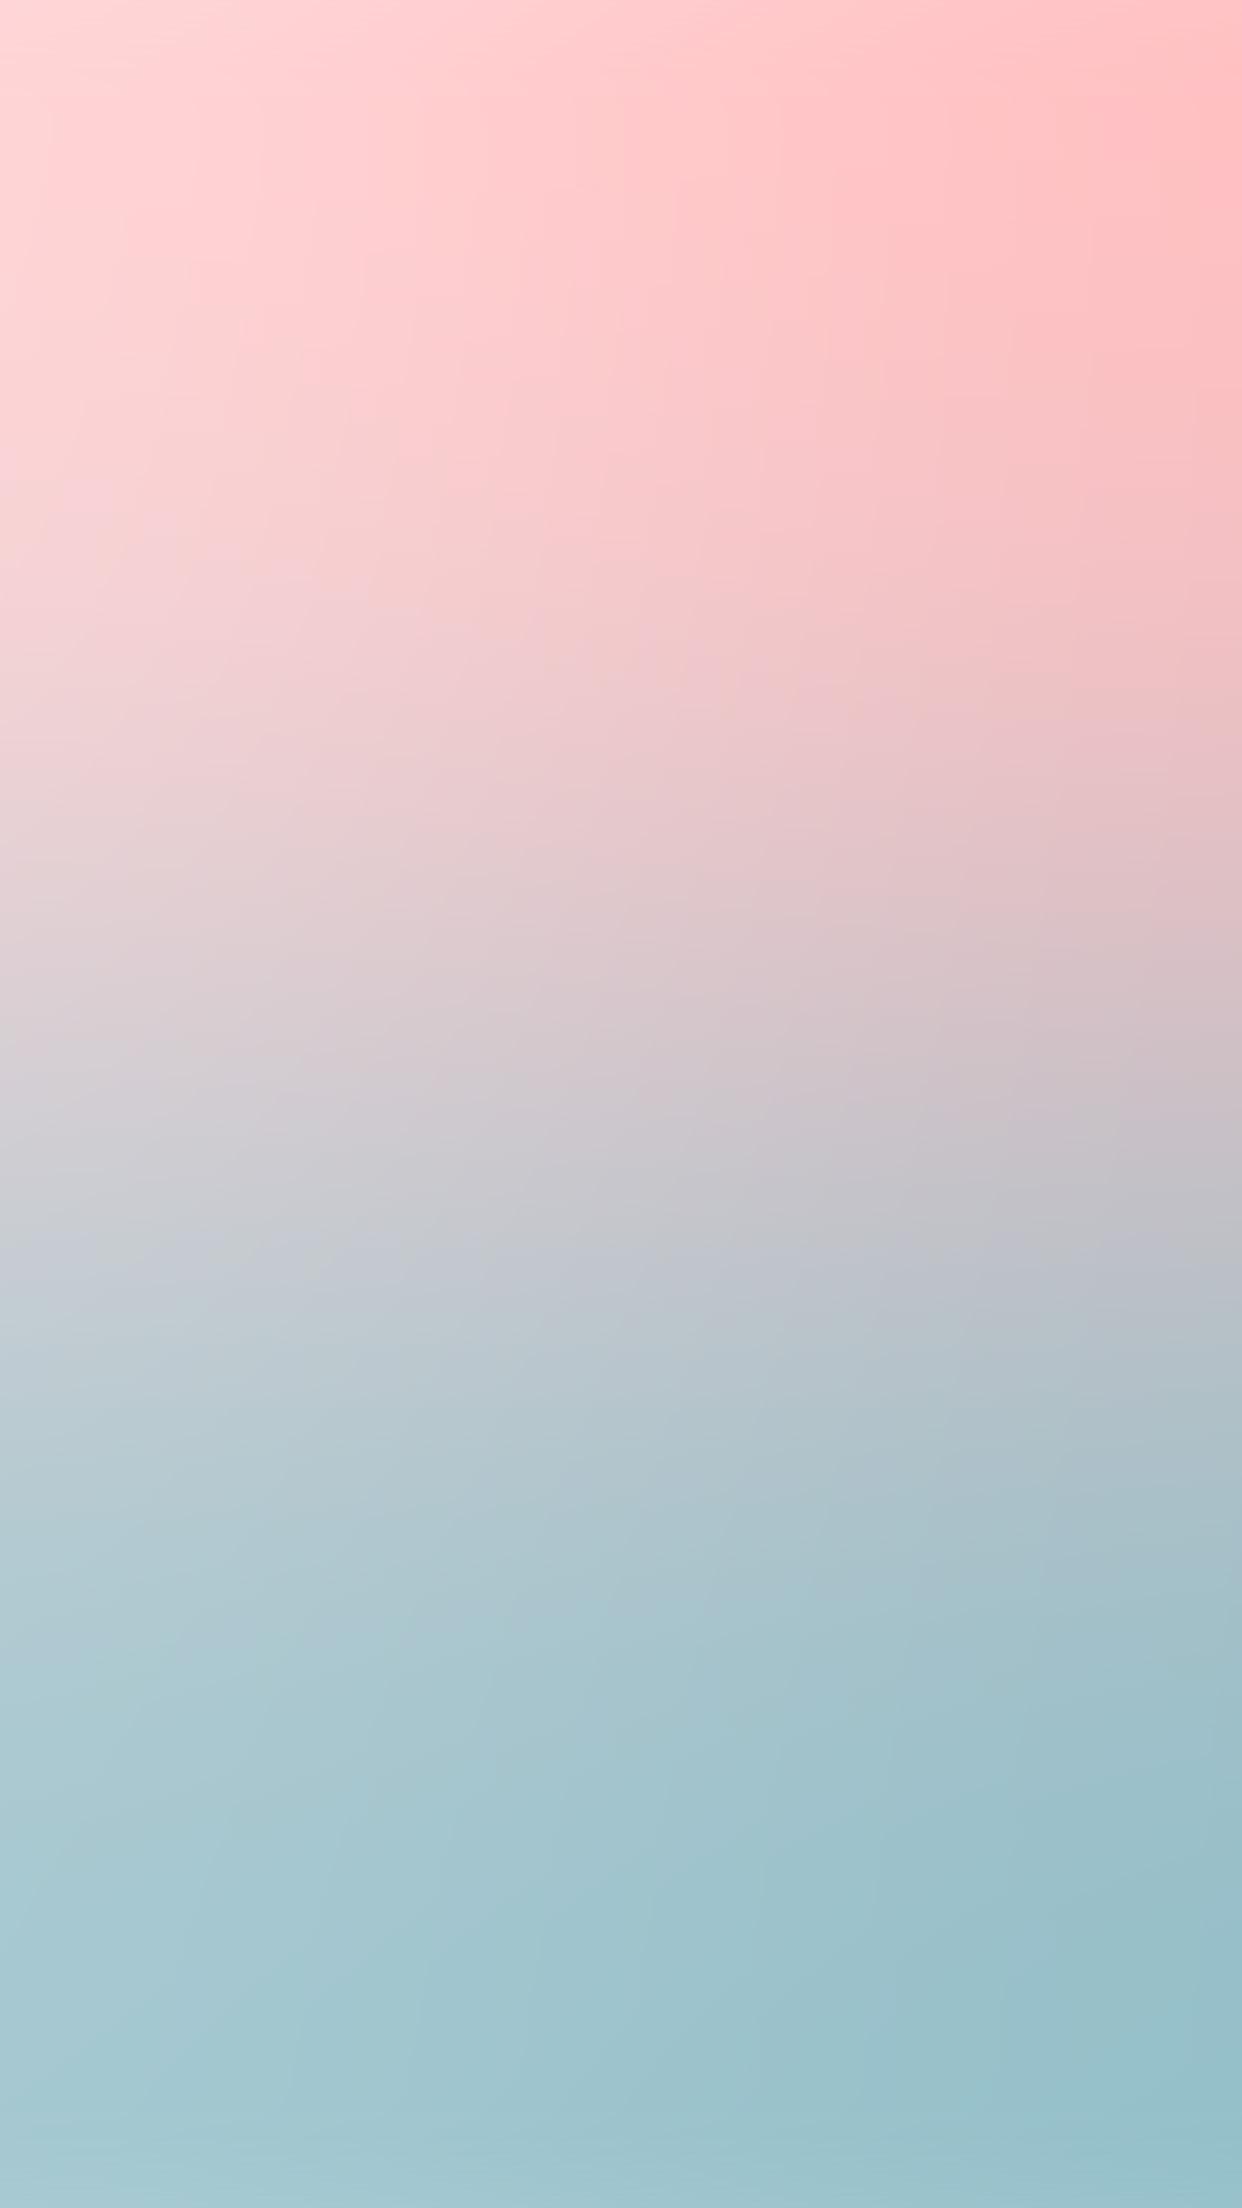 Iphone7paperscom Iphone7 Wallpaper Sm07 Pink Blue Soft Pastel